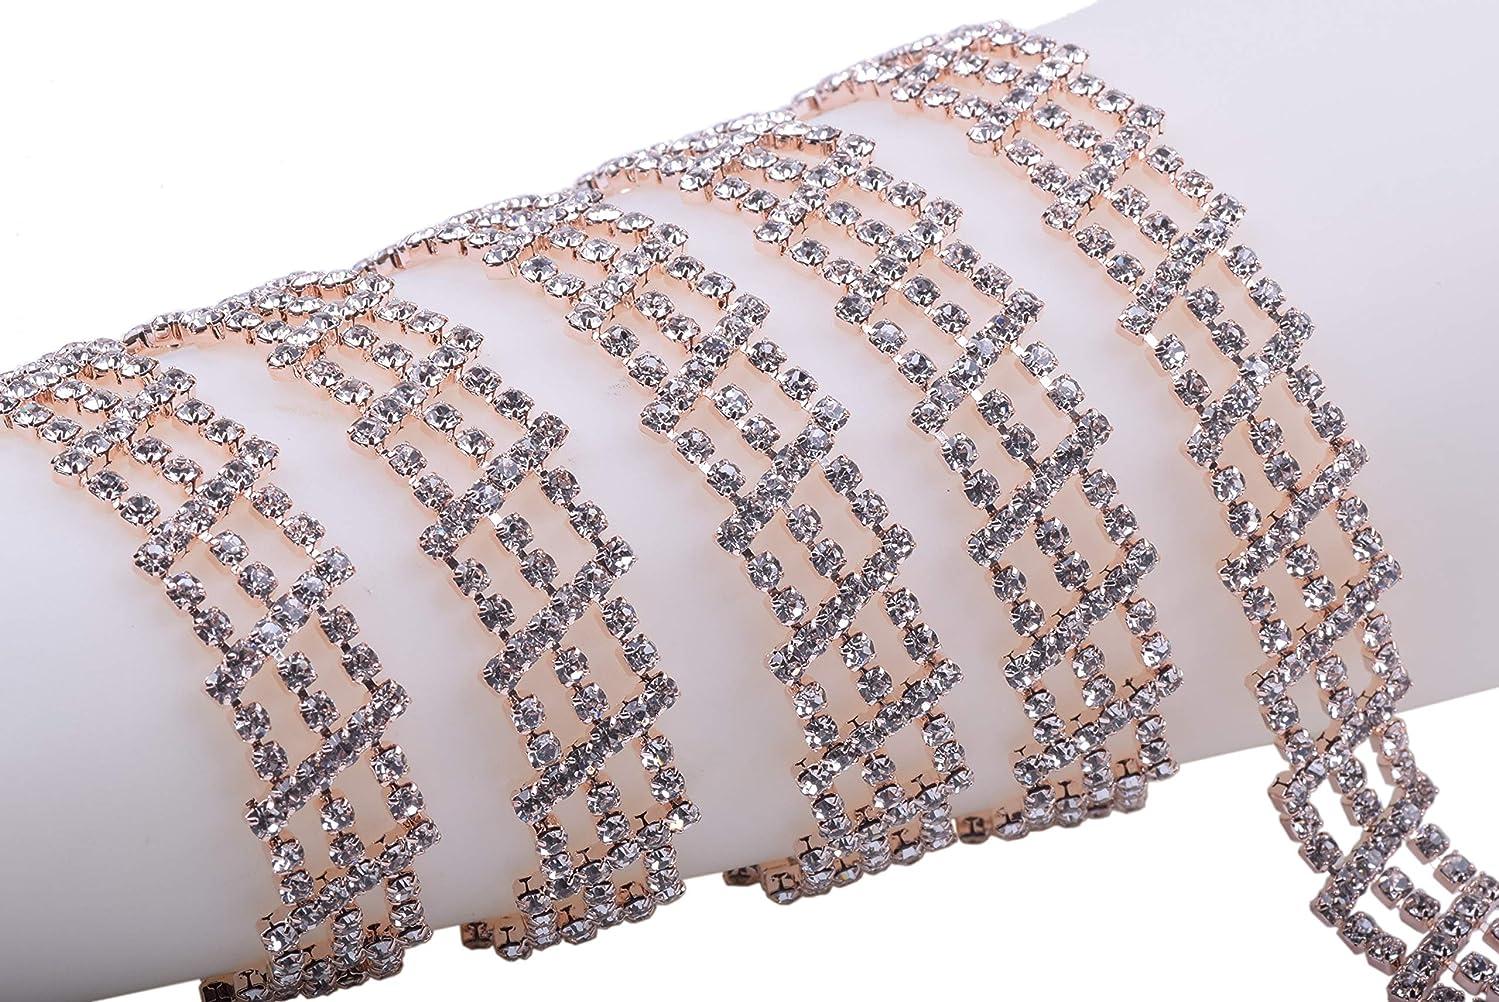 KAOYOO 1 Yard Lattice Crystal Rhinestone Rose Gold Chain Trim with Clear Crystal Rhinestone Chain for Sewing Craft,Wedding Decoration